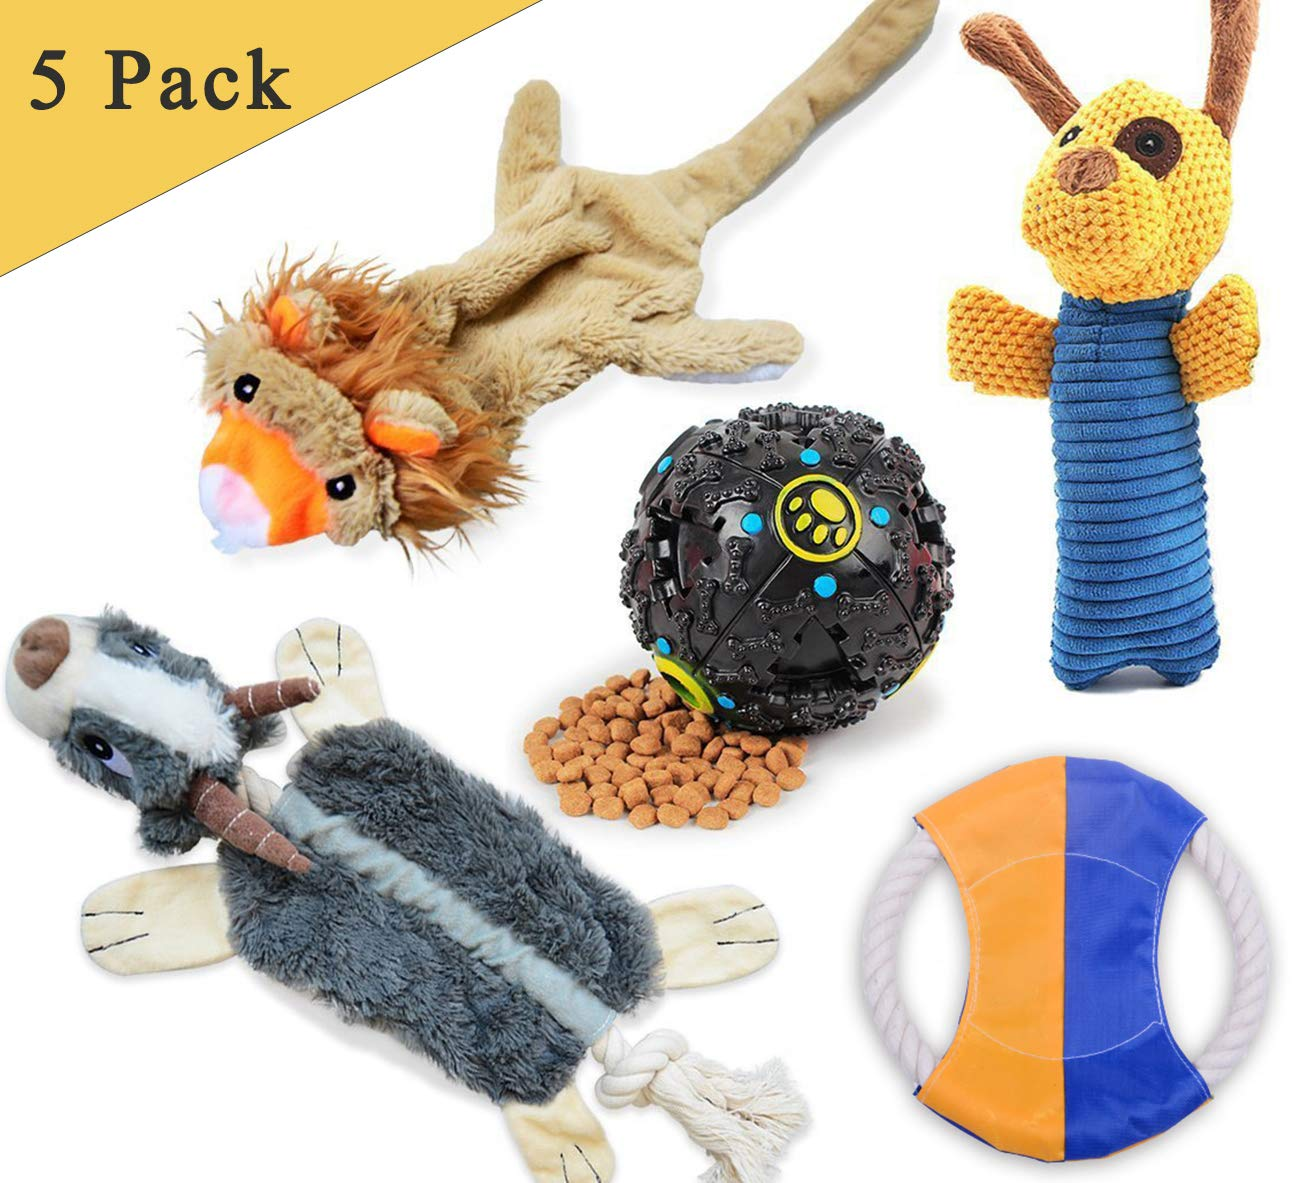 LOOBANI Dog Toys 5 Set丨 Plush Squeaky Toy Stuffed, Durable Knot Chew Toys, Cotton Rope Frisbee, Dispenses Treat Ball Assortment Small Medium Dog